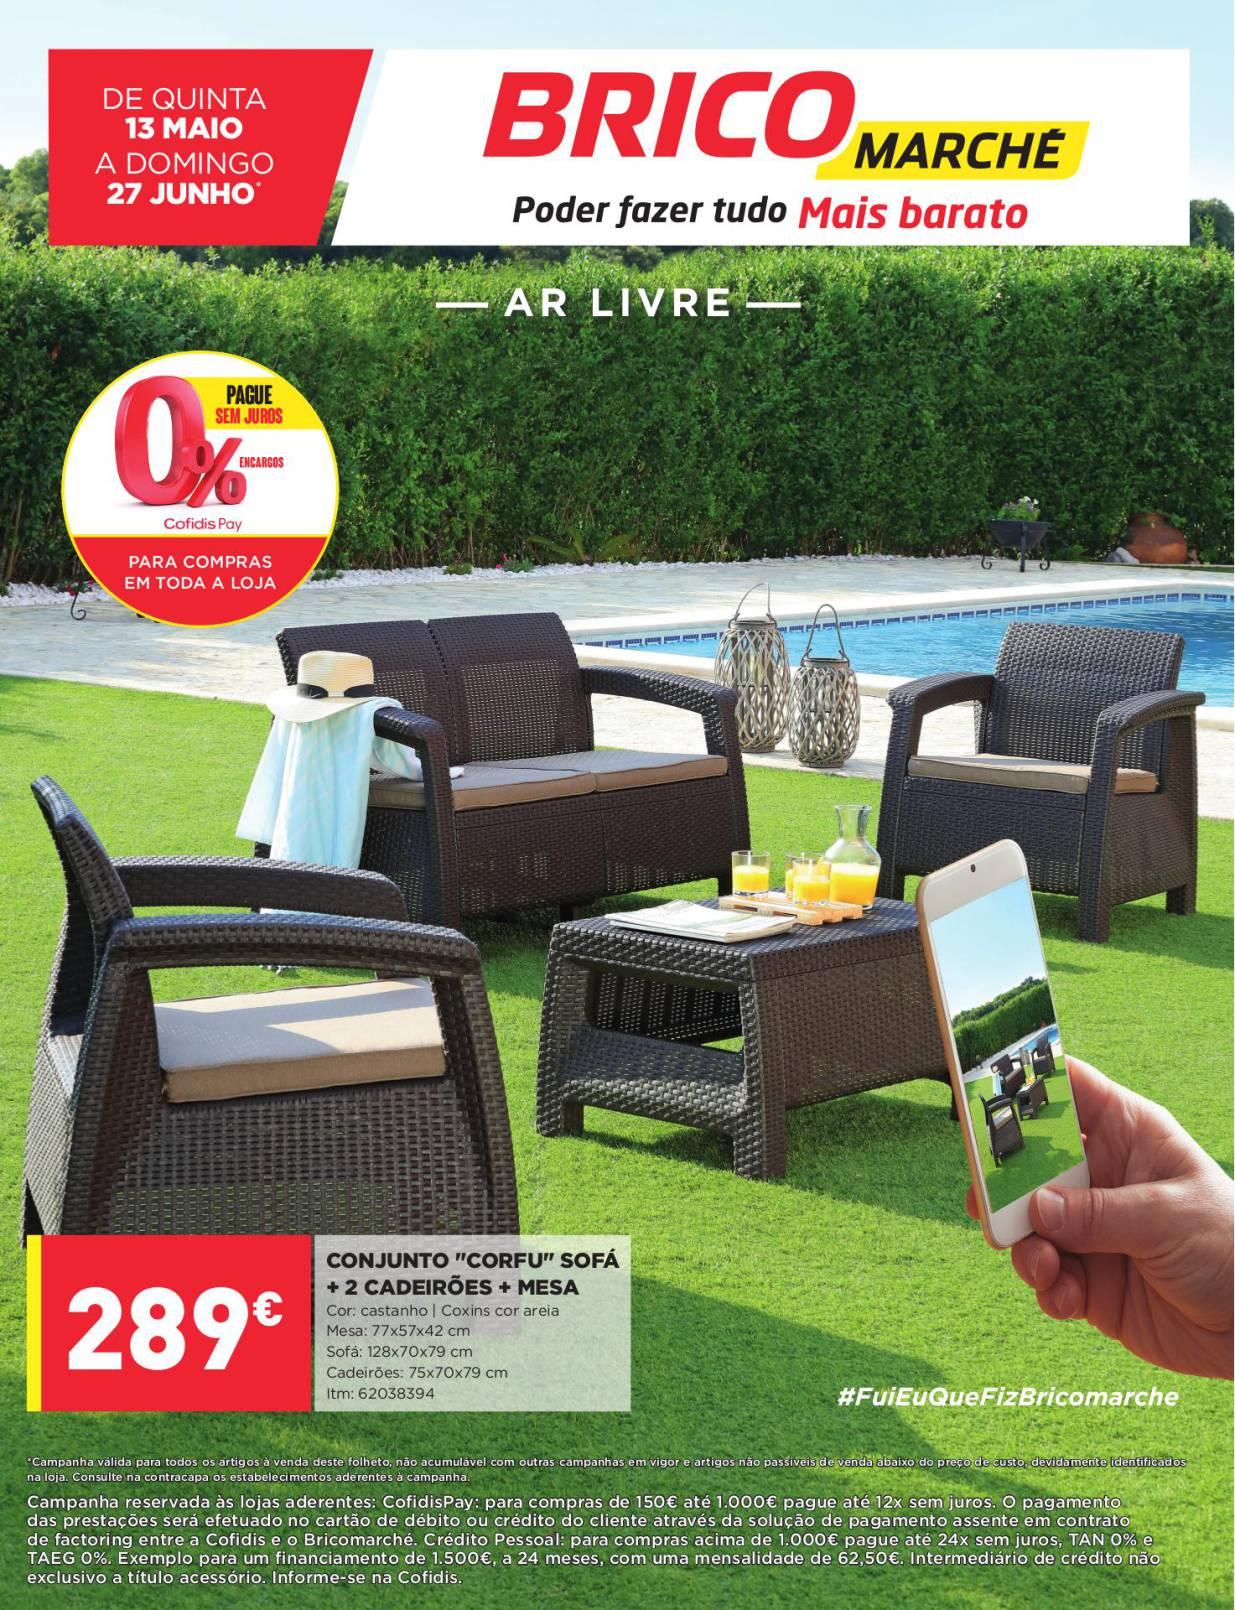 bricomarche folheto extra 13 maio 1